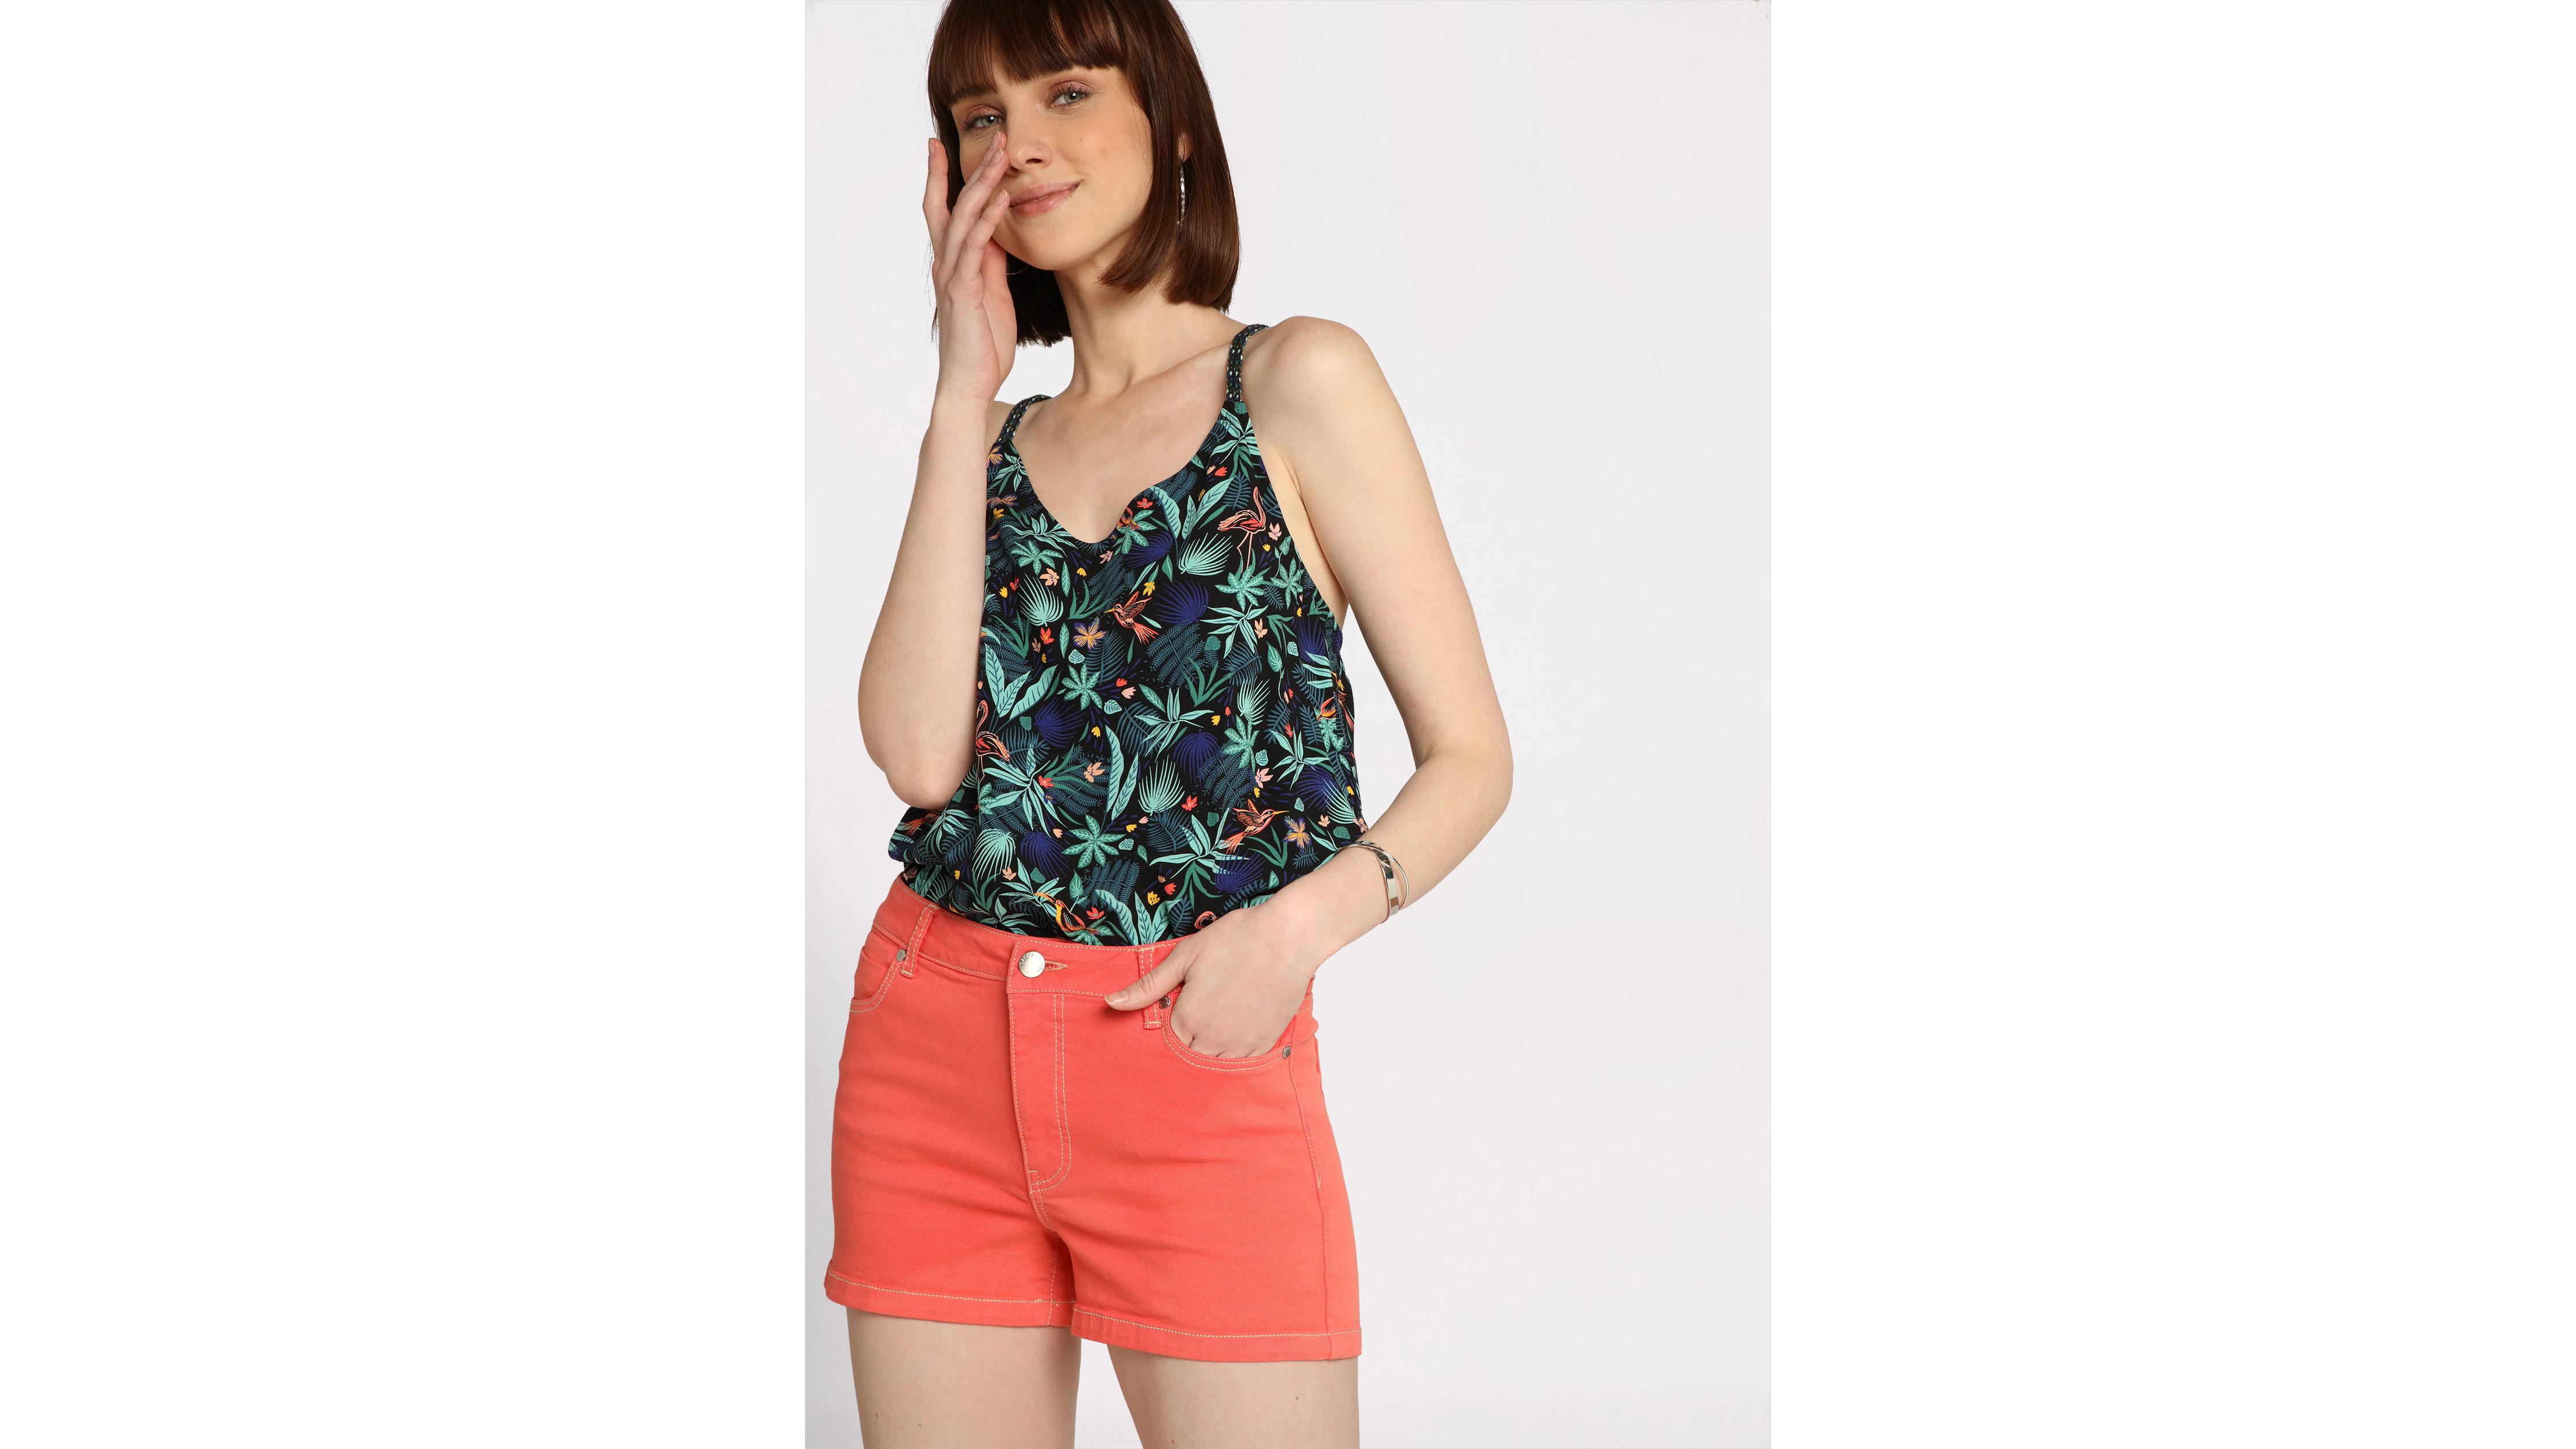 Corail Femme 5 Poches Rose Short Mini uTlJc5K13F